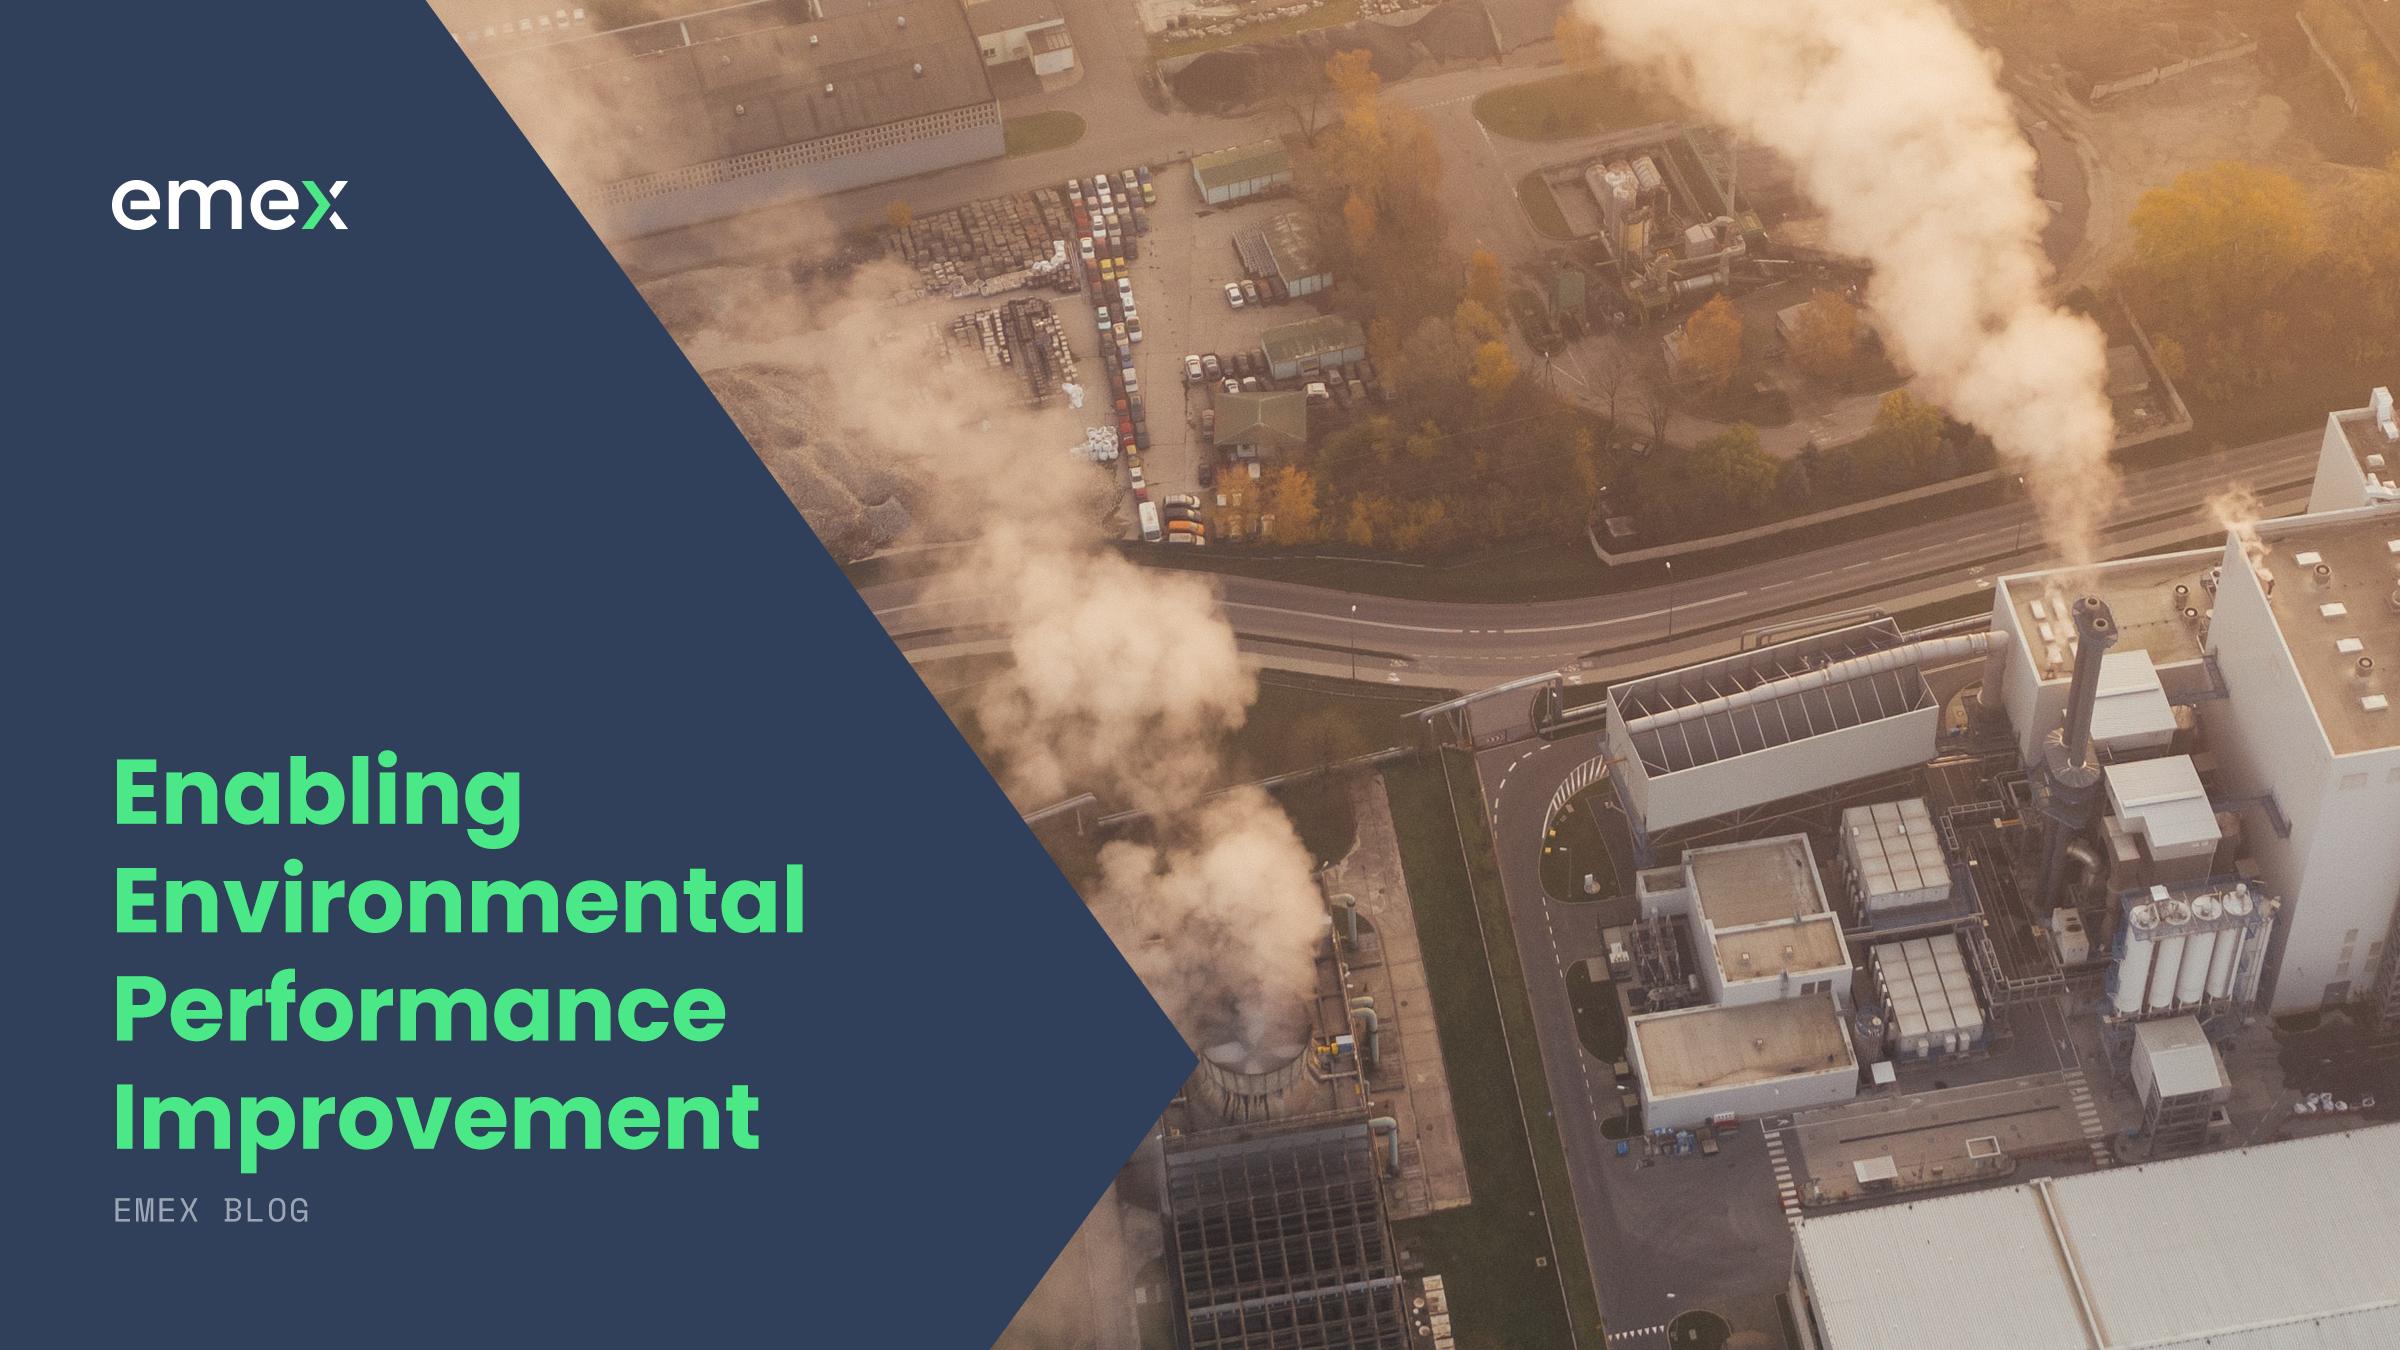 Enabling Environmental Performance Improvement